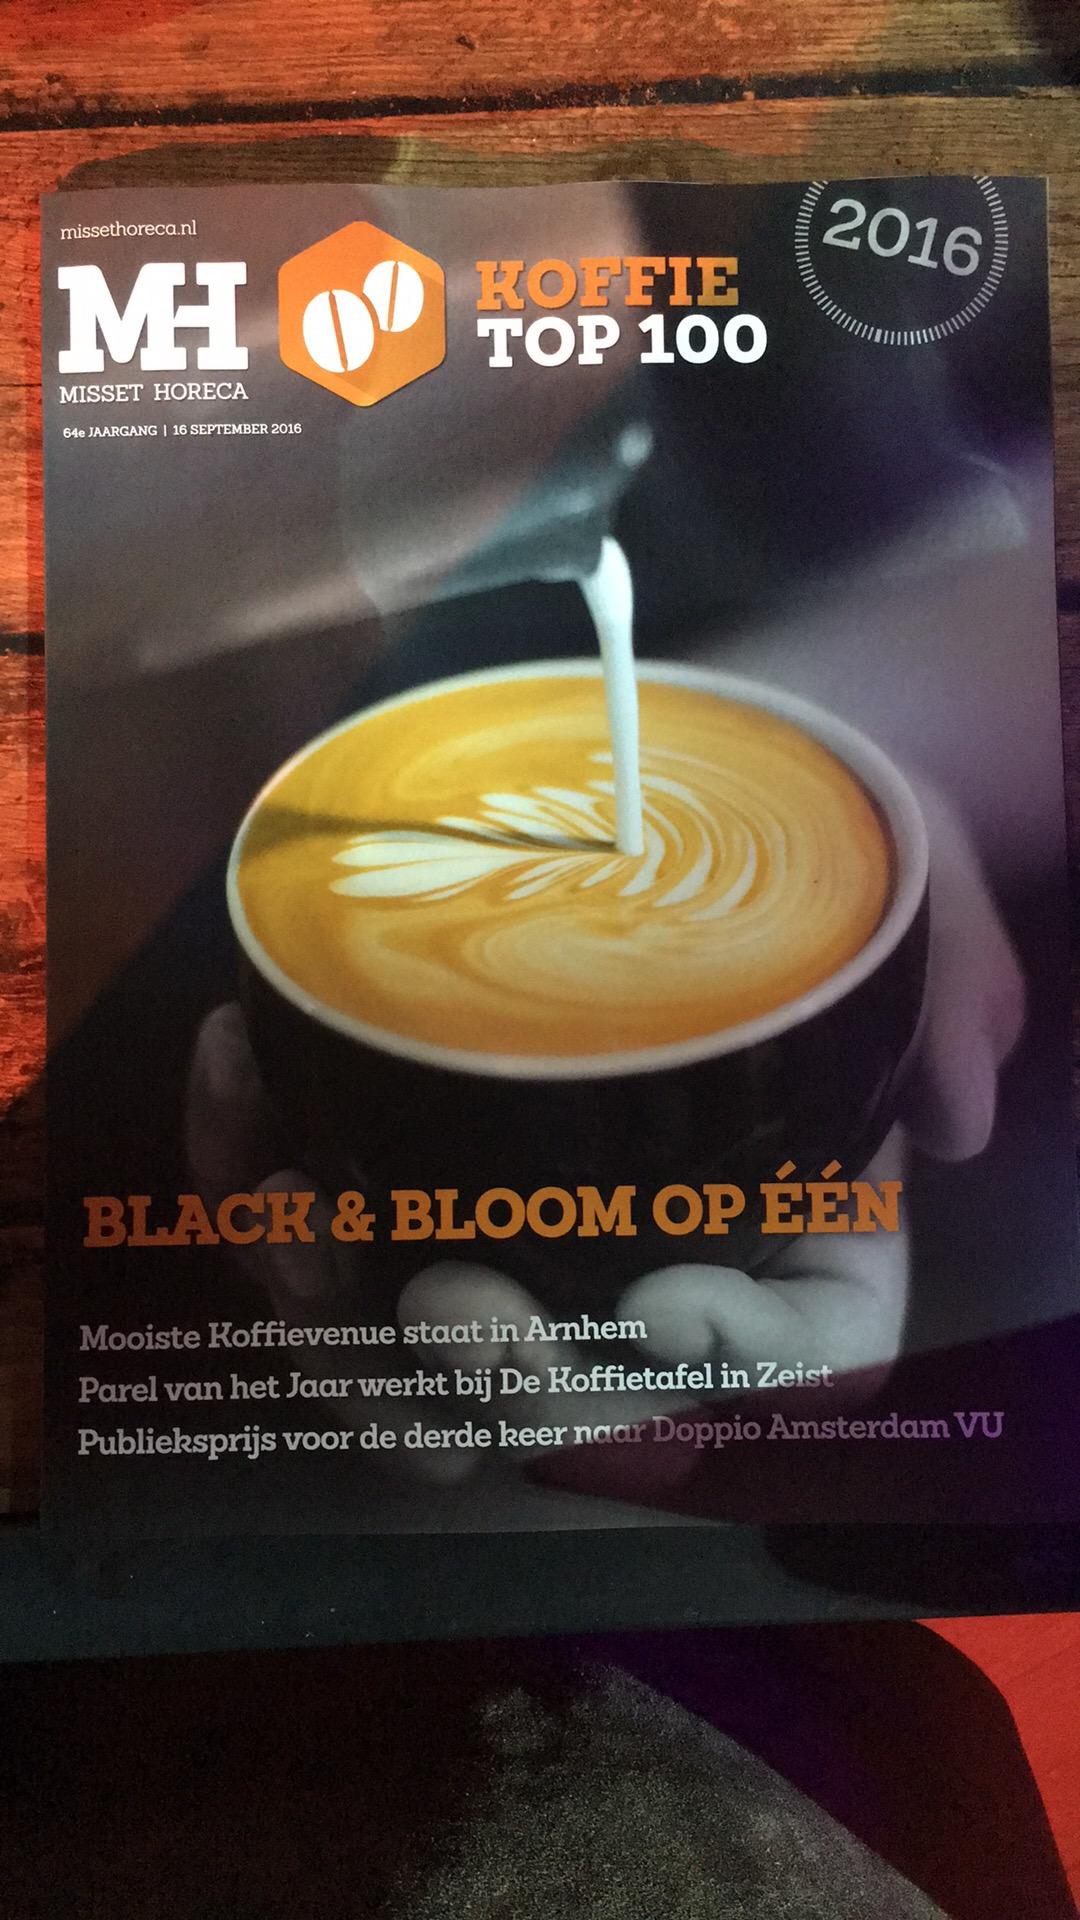 Misset Horeca Koffie TOP100